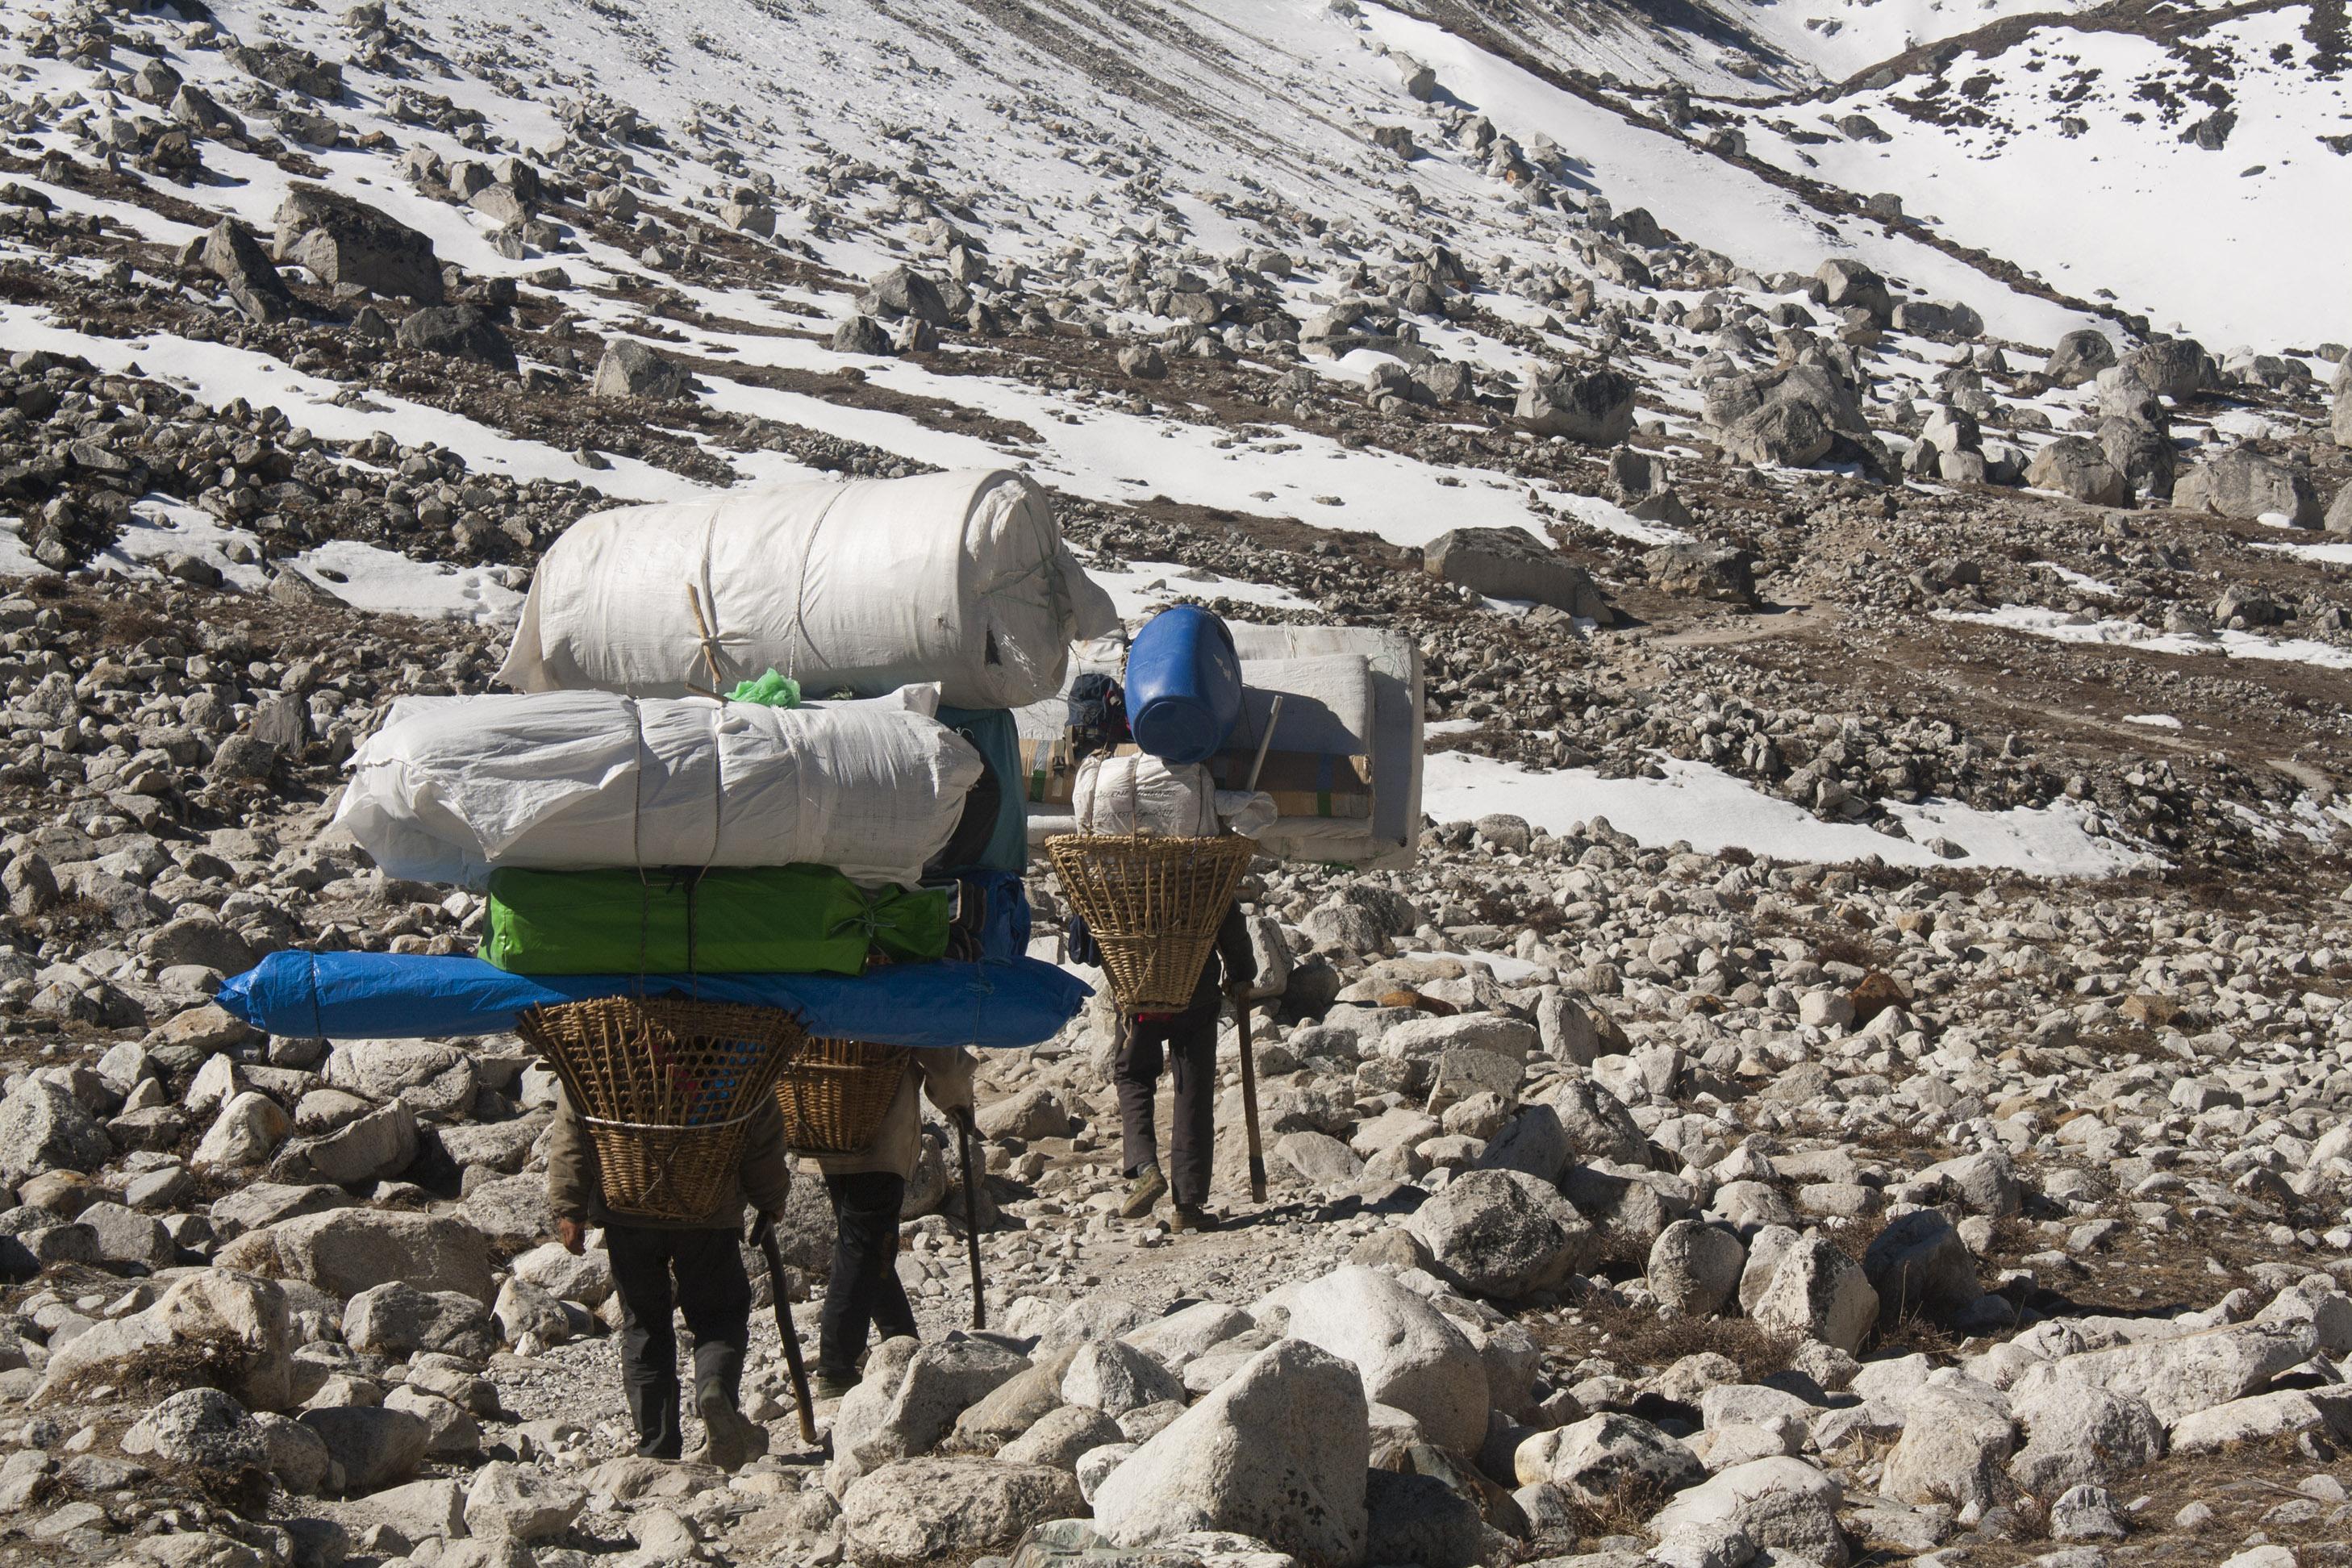 Sherpas_on_the_Trail_Nearing_Lobuche,_Nepal